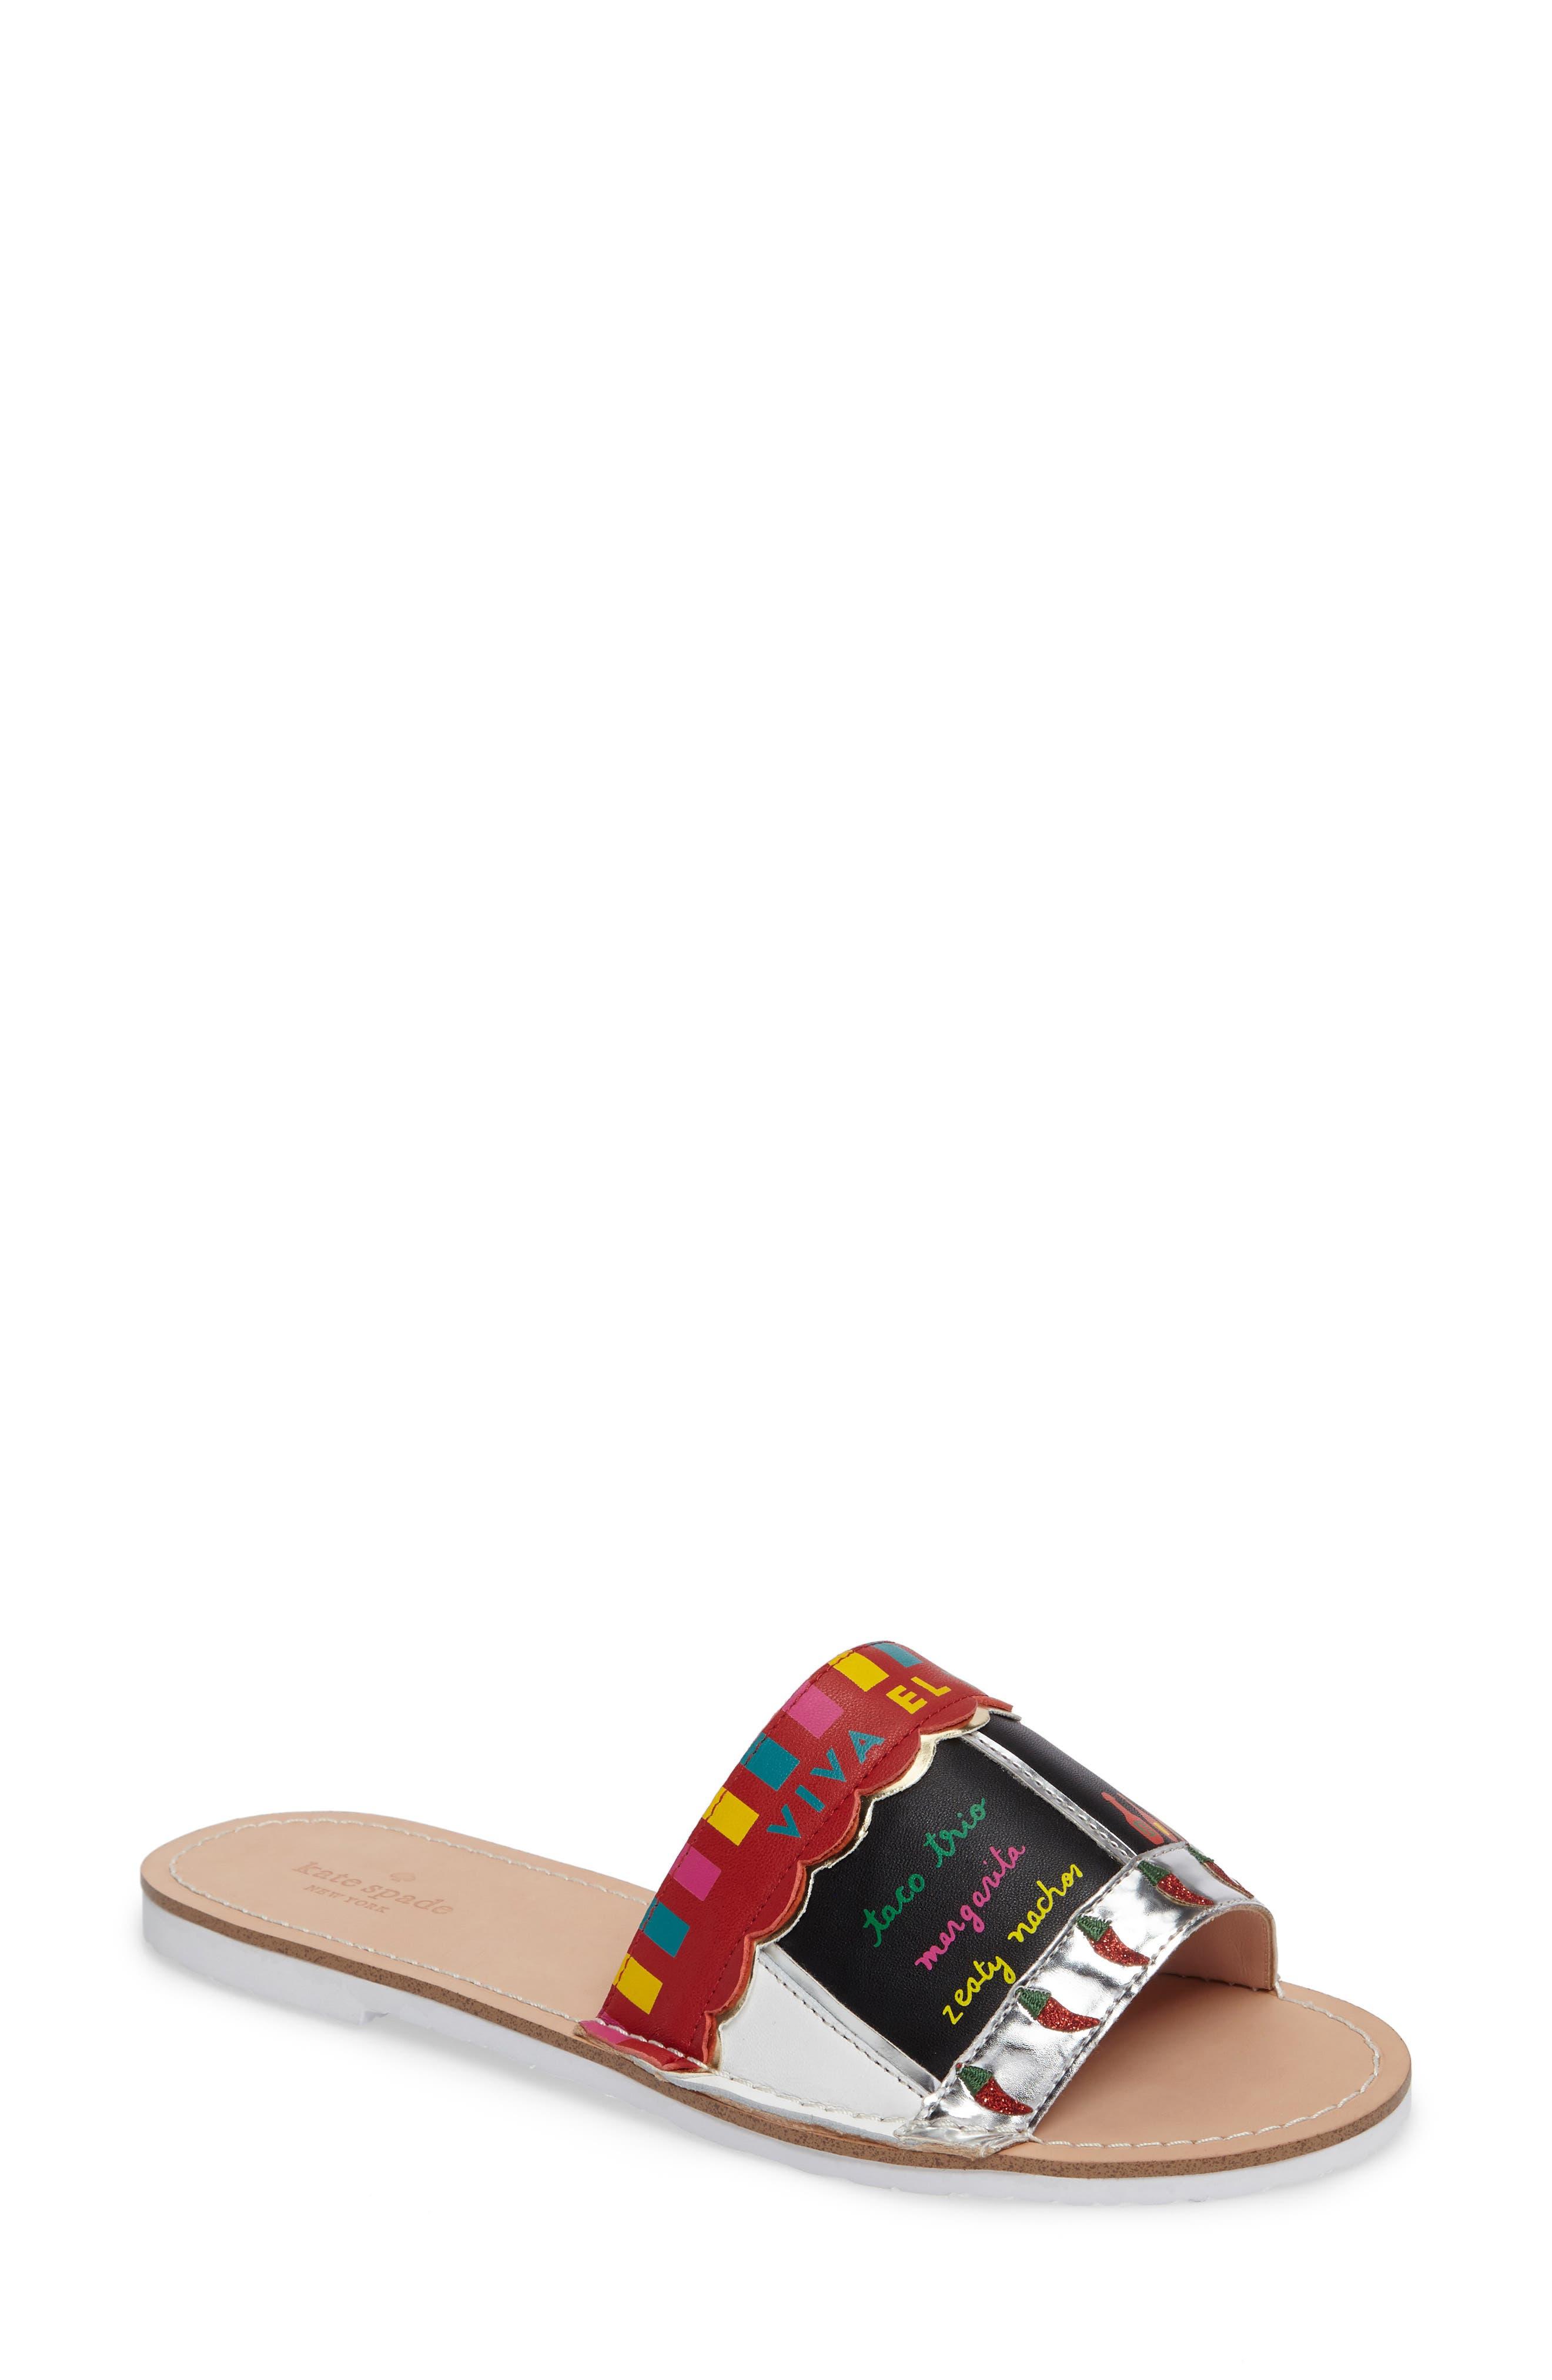 illi slide sandal,                         Main,                         color, 001